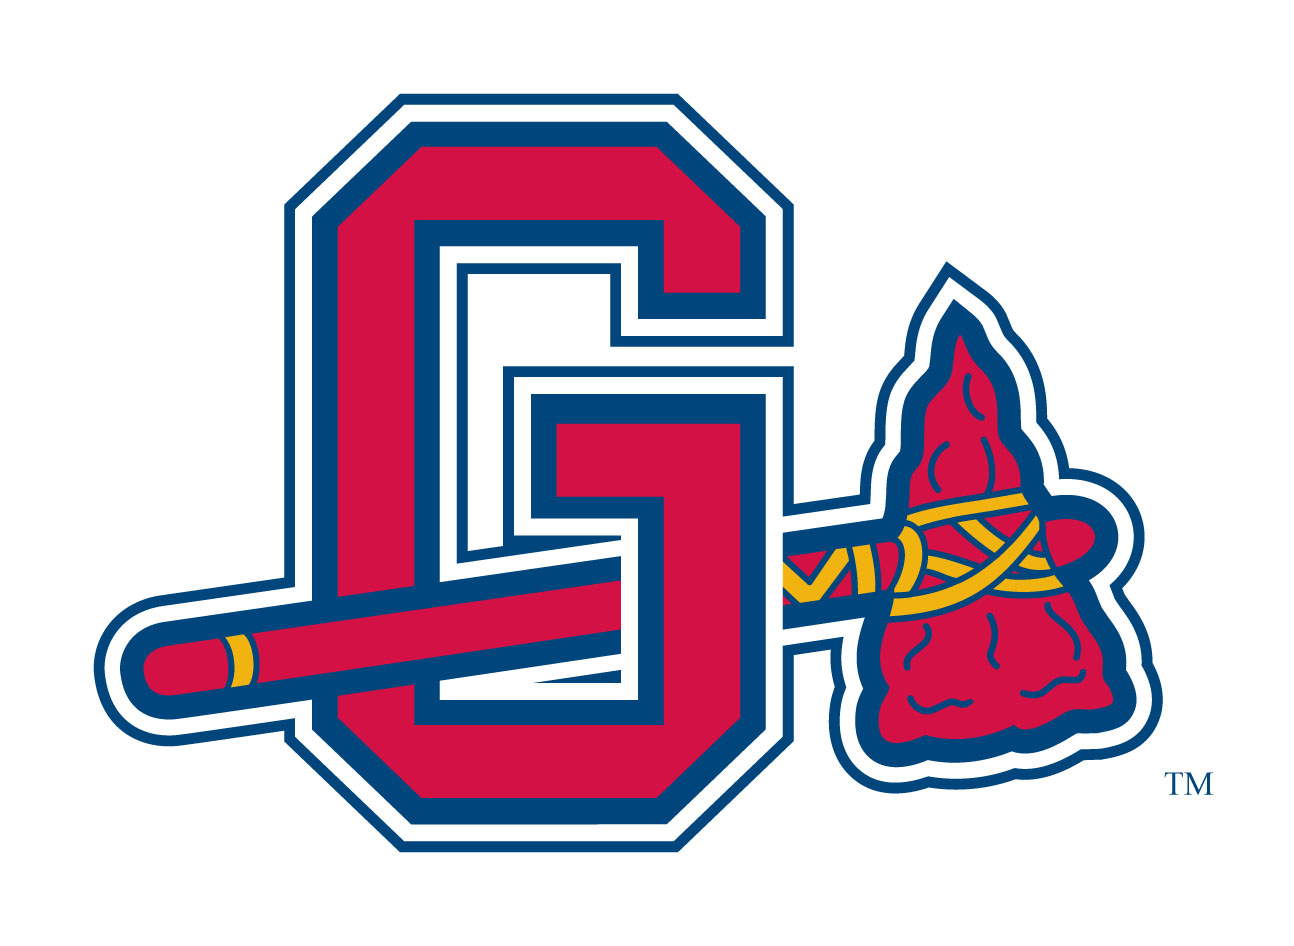 Gwinnett Braves to change name – The Dutch Baseball Hangout